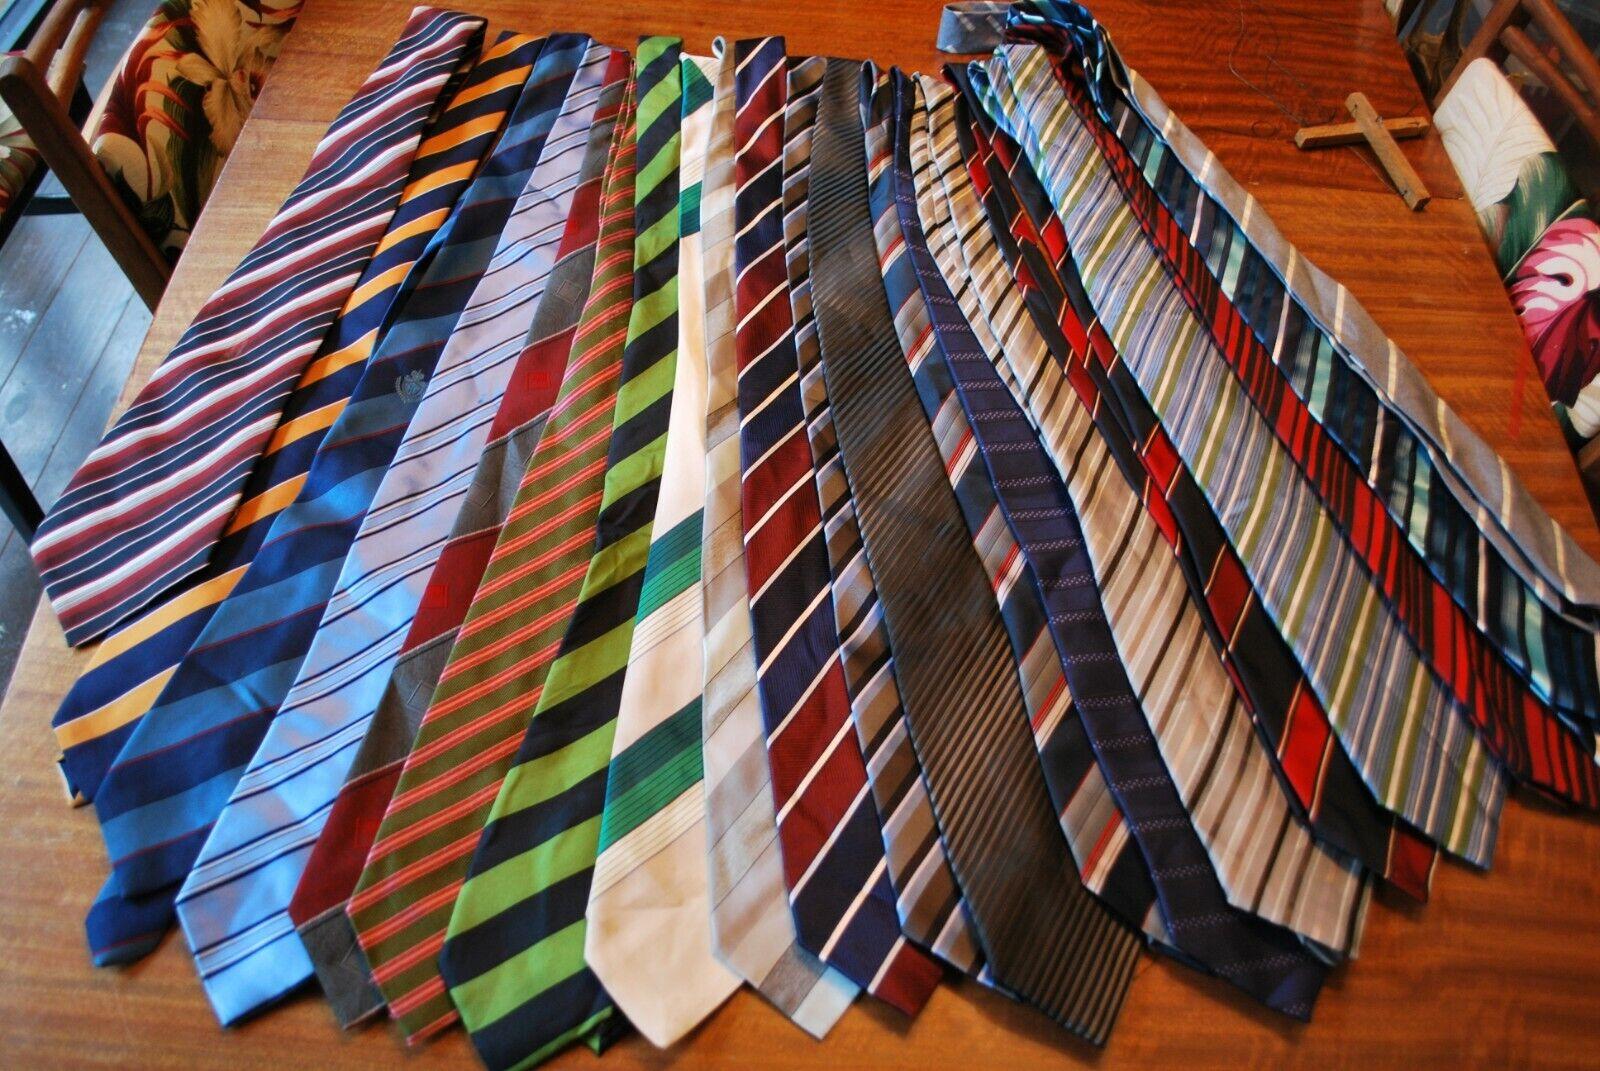 20 x various coloured striped Tie's job lot bulk buy 10